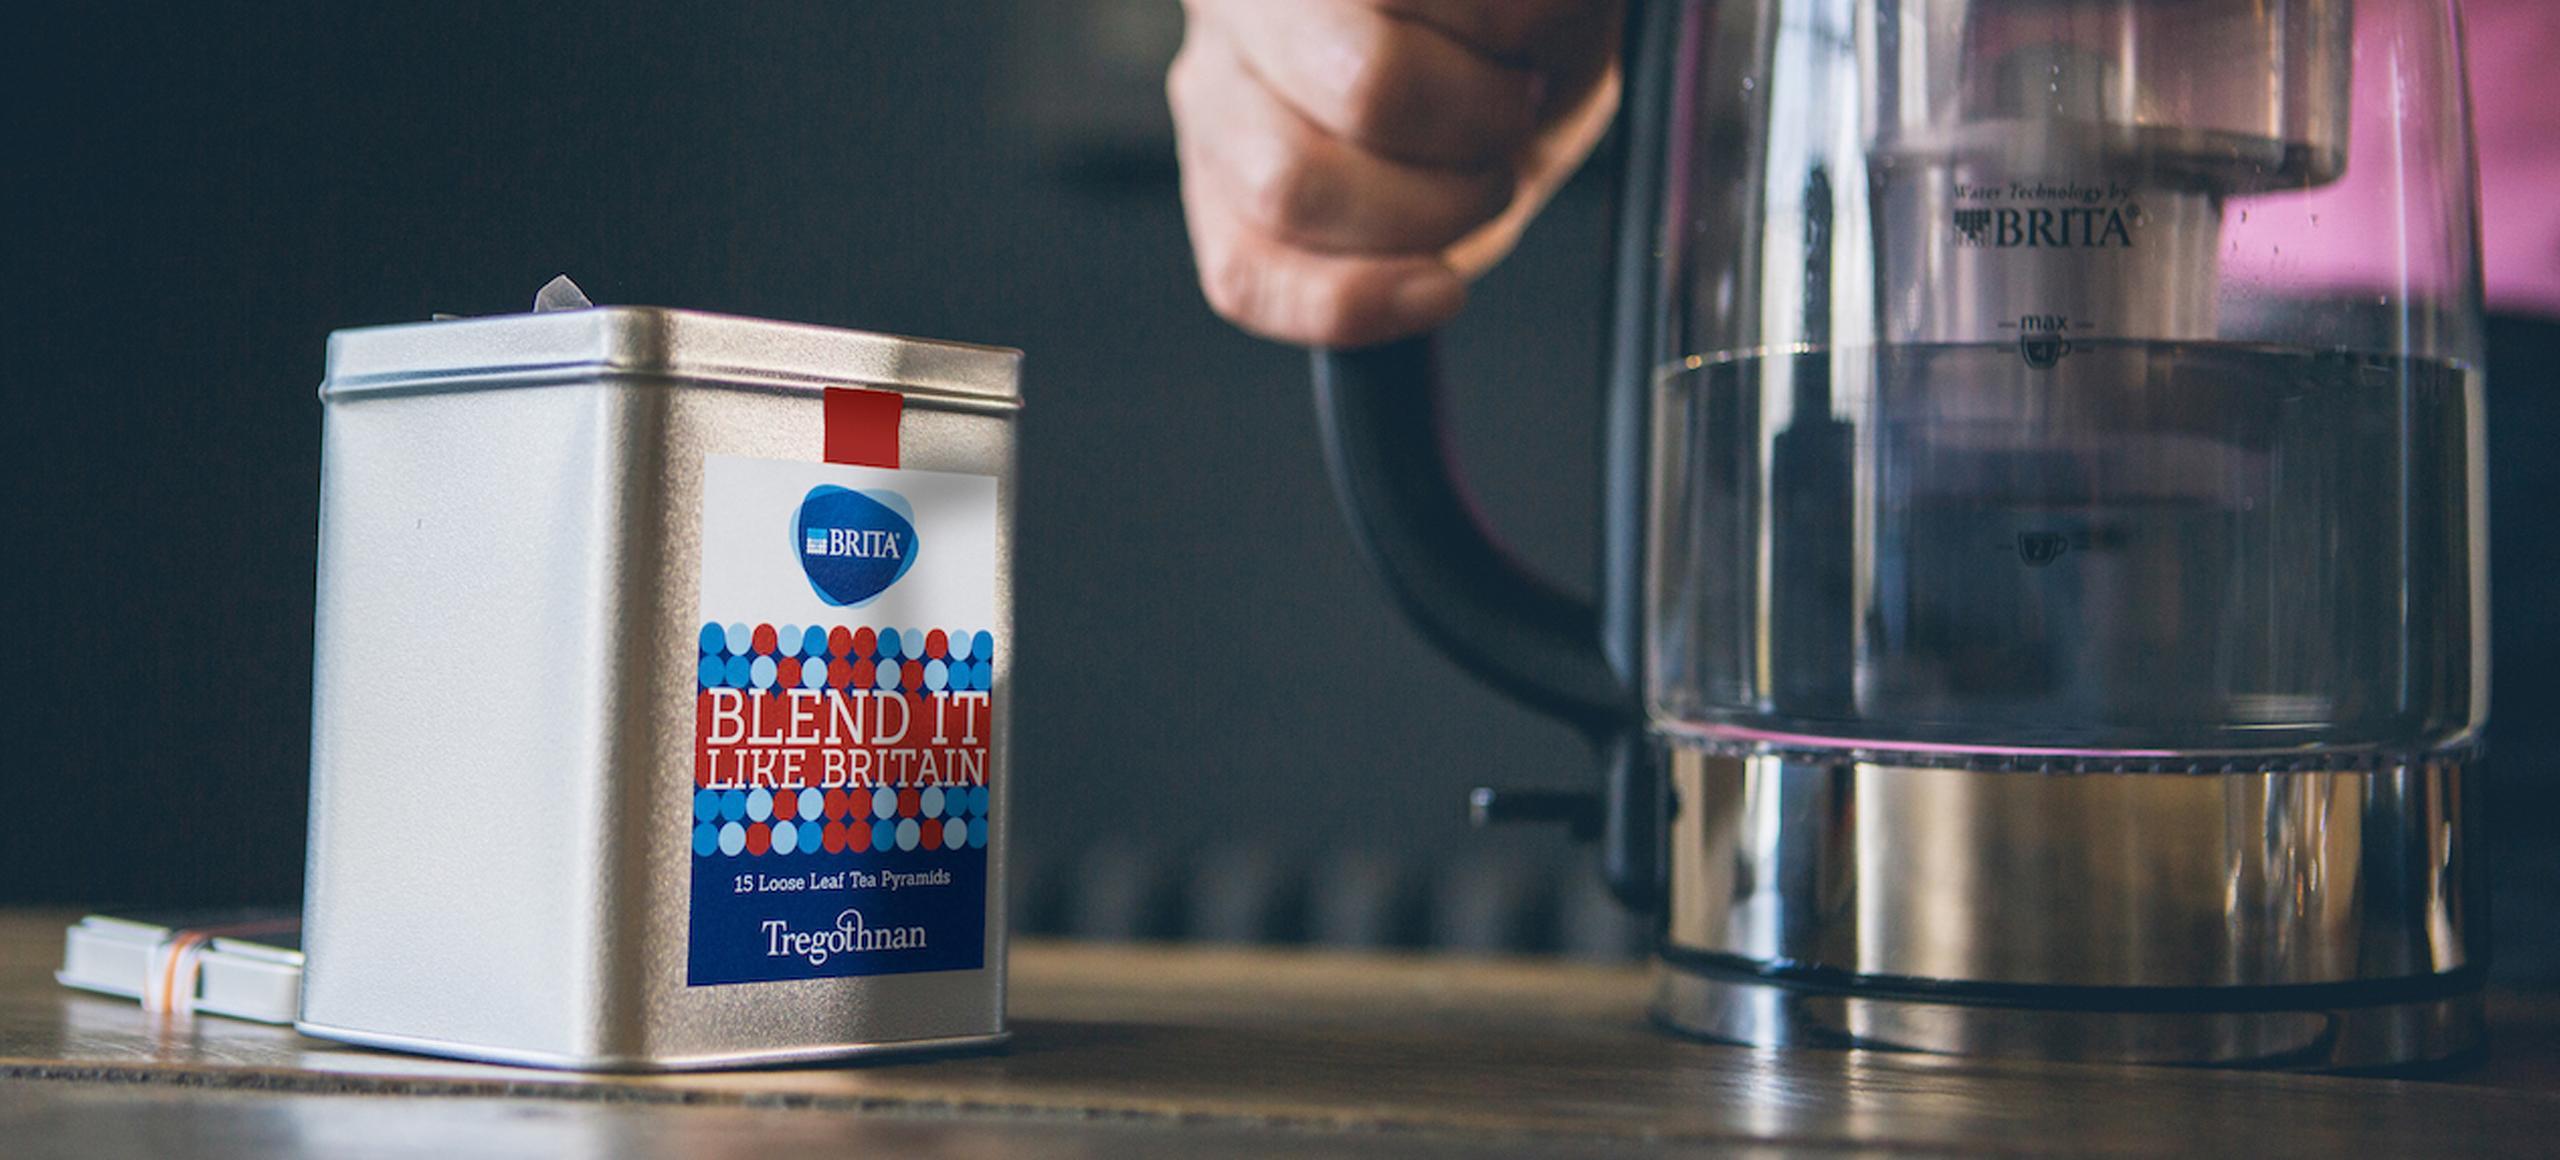 Blend It Like BRITA tea by BRITA and Tregothnan